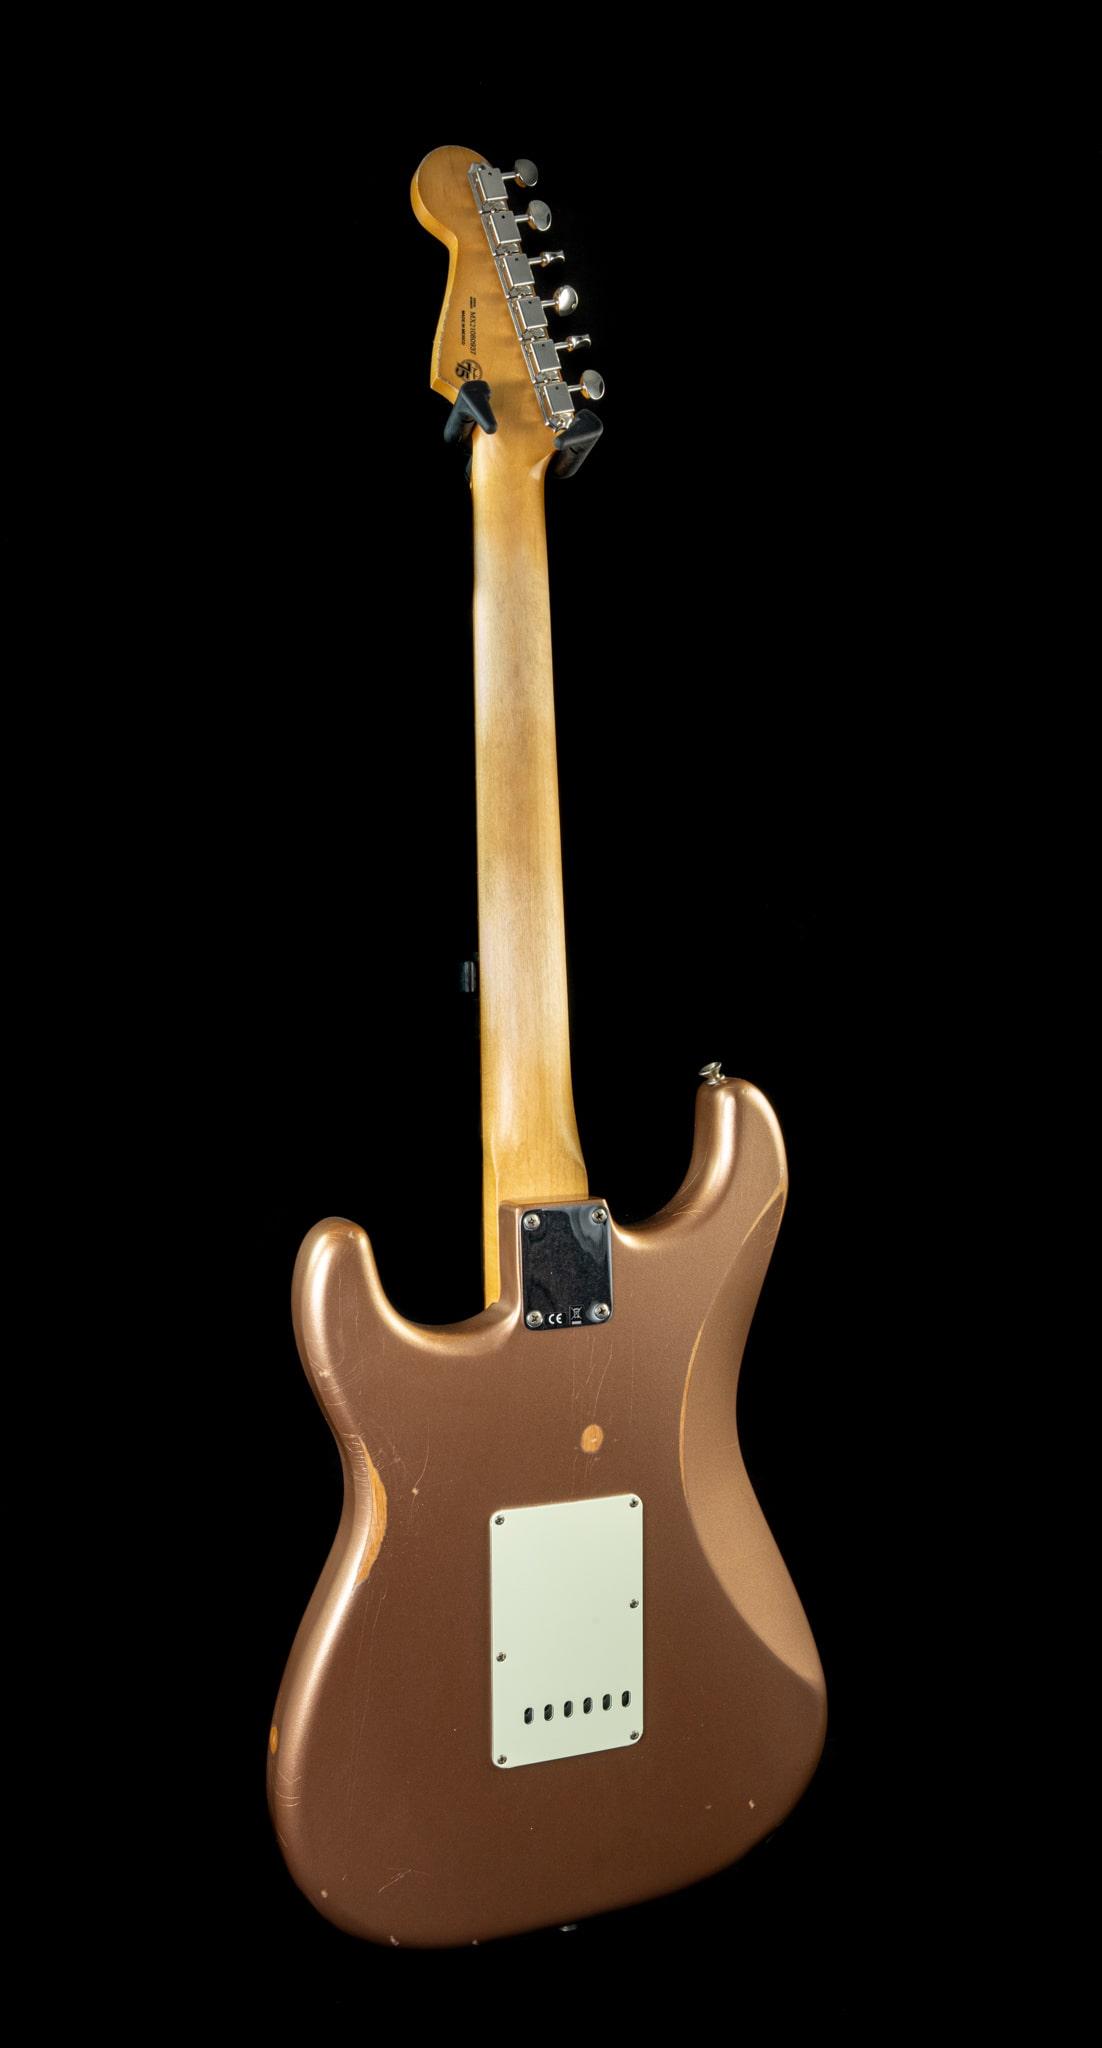 Fender Vintera Road Worn '60s Stratocaster in Firemist Gold